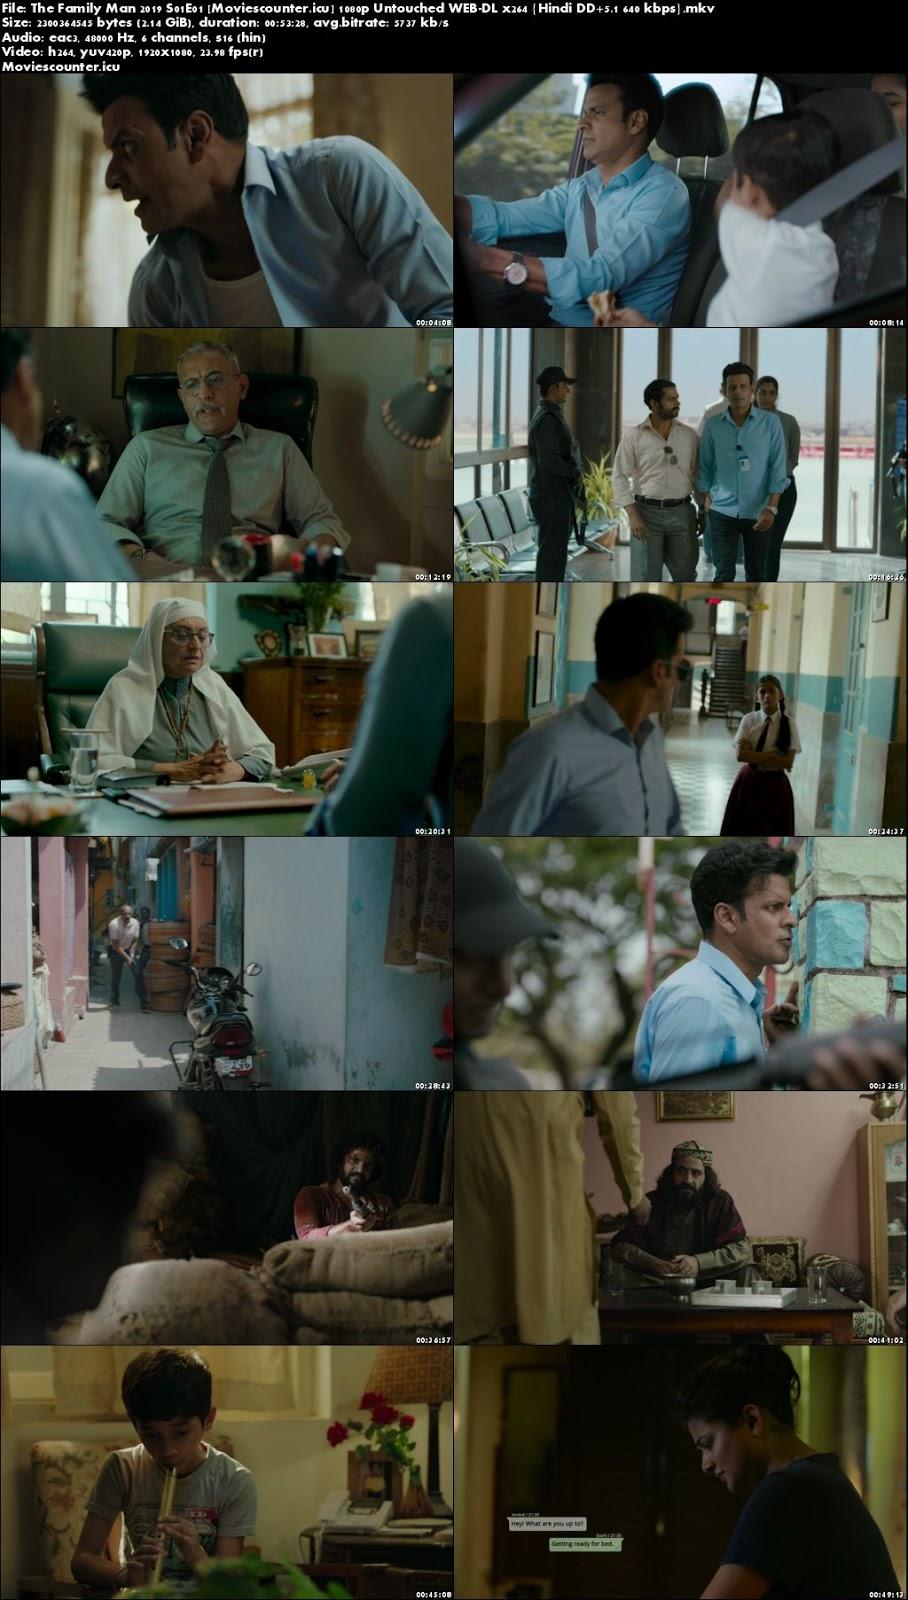 Screen Shots The Family Man 2019 Seasons 1 Full Episodes 1080p HD